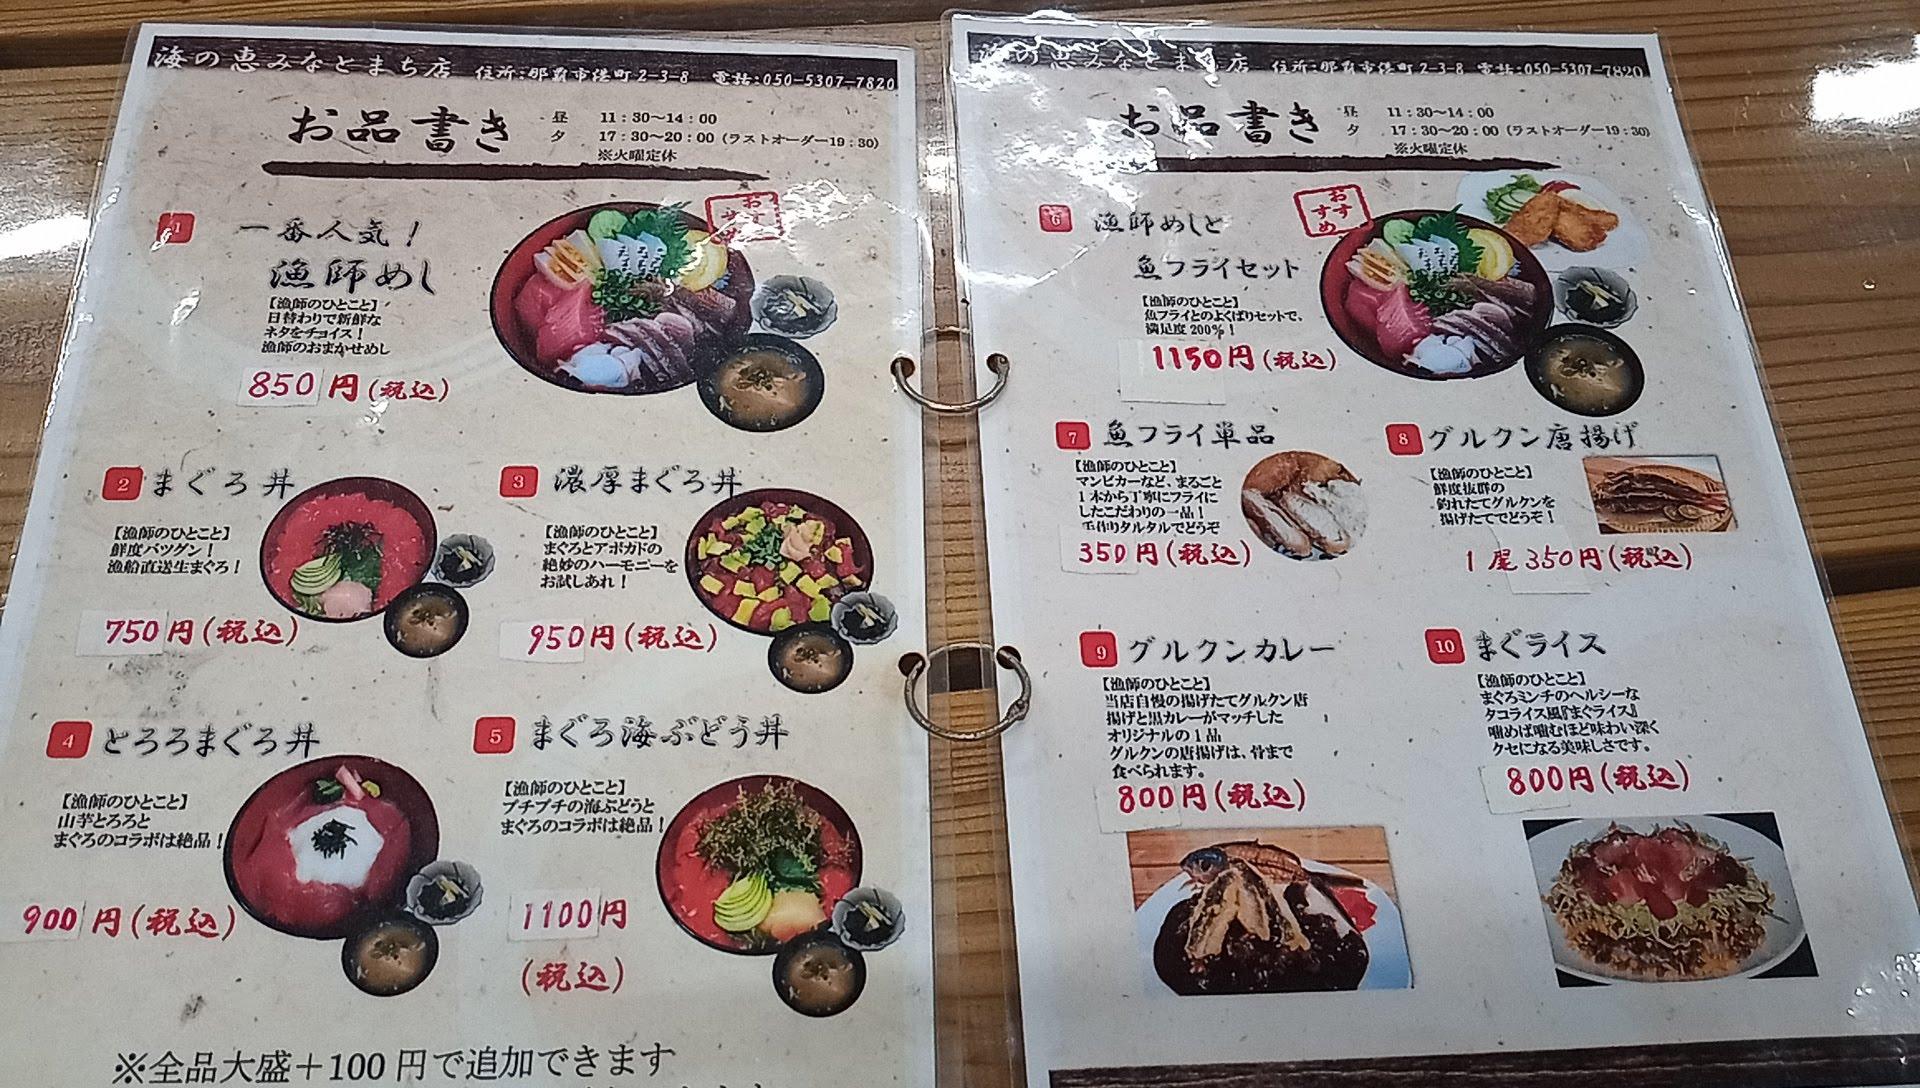 the menu of Umi no Megumi 1